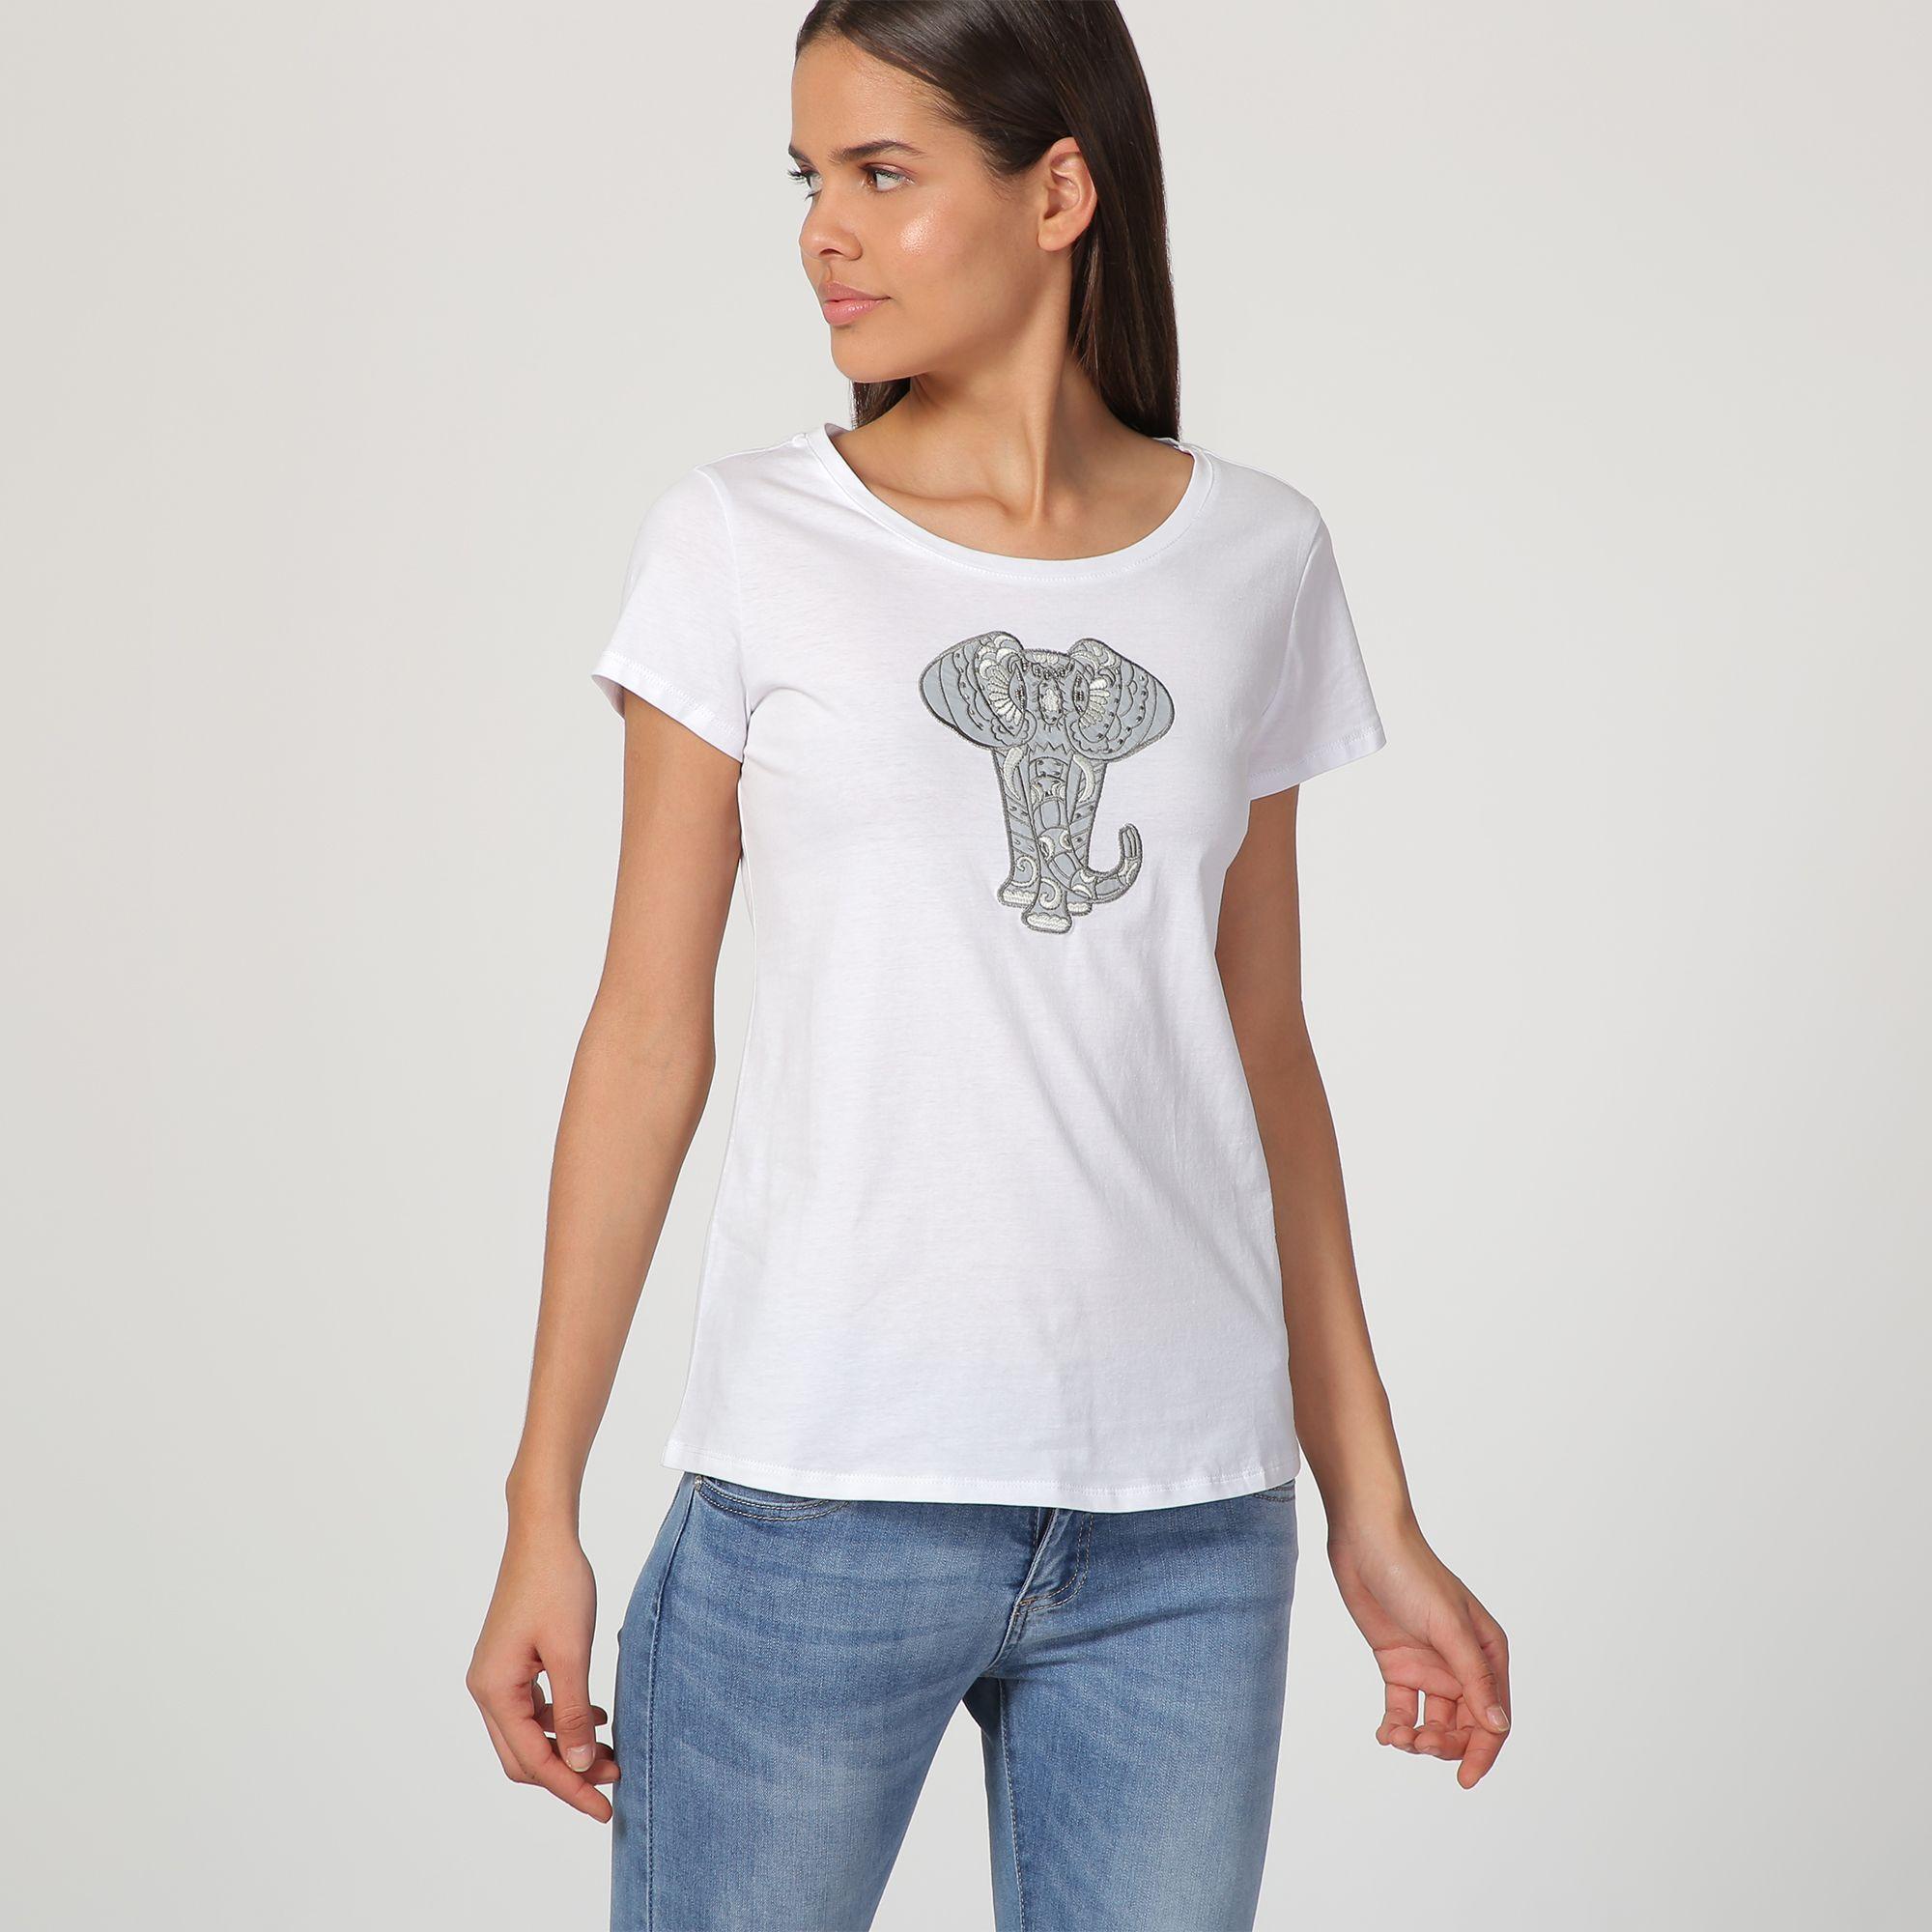 Camiseta de elefante